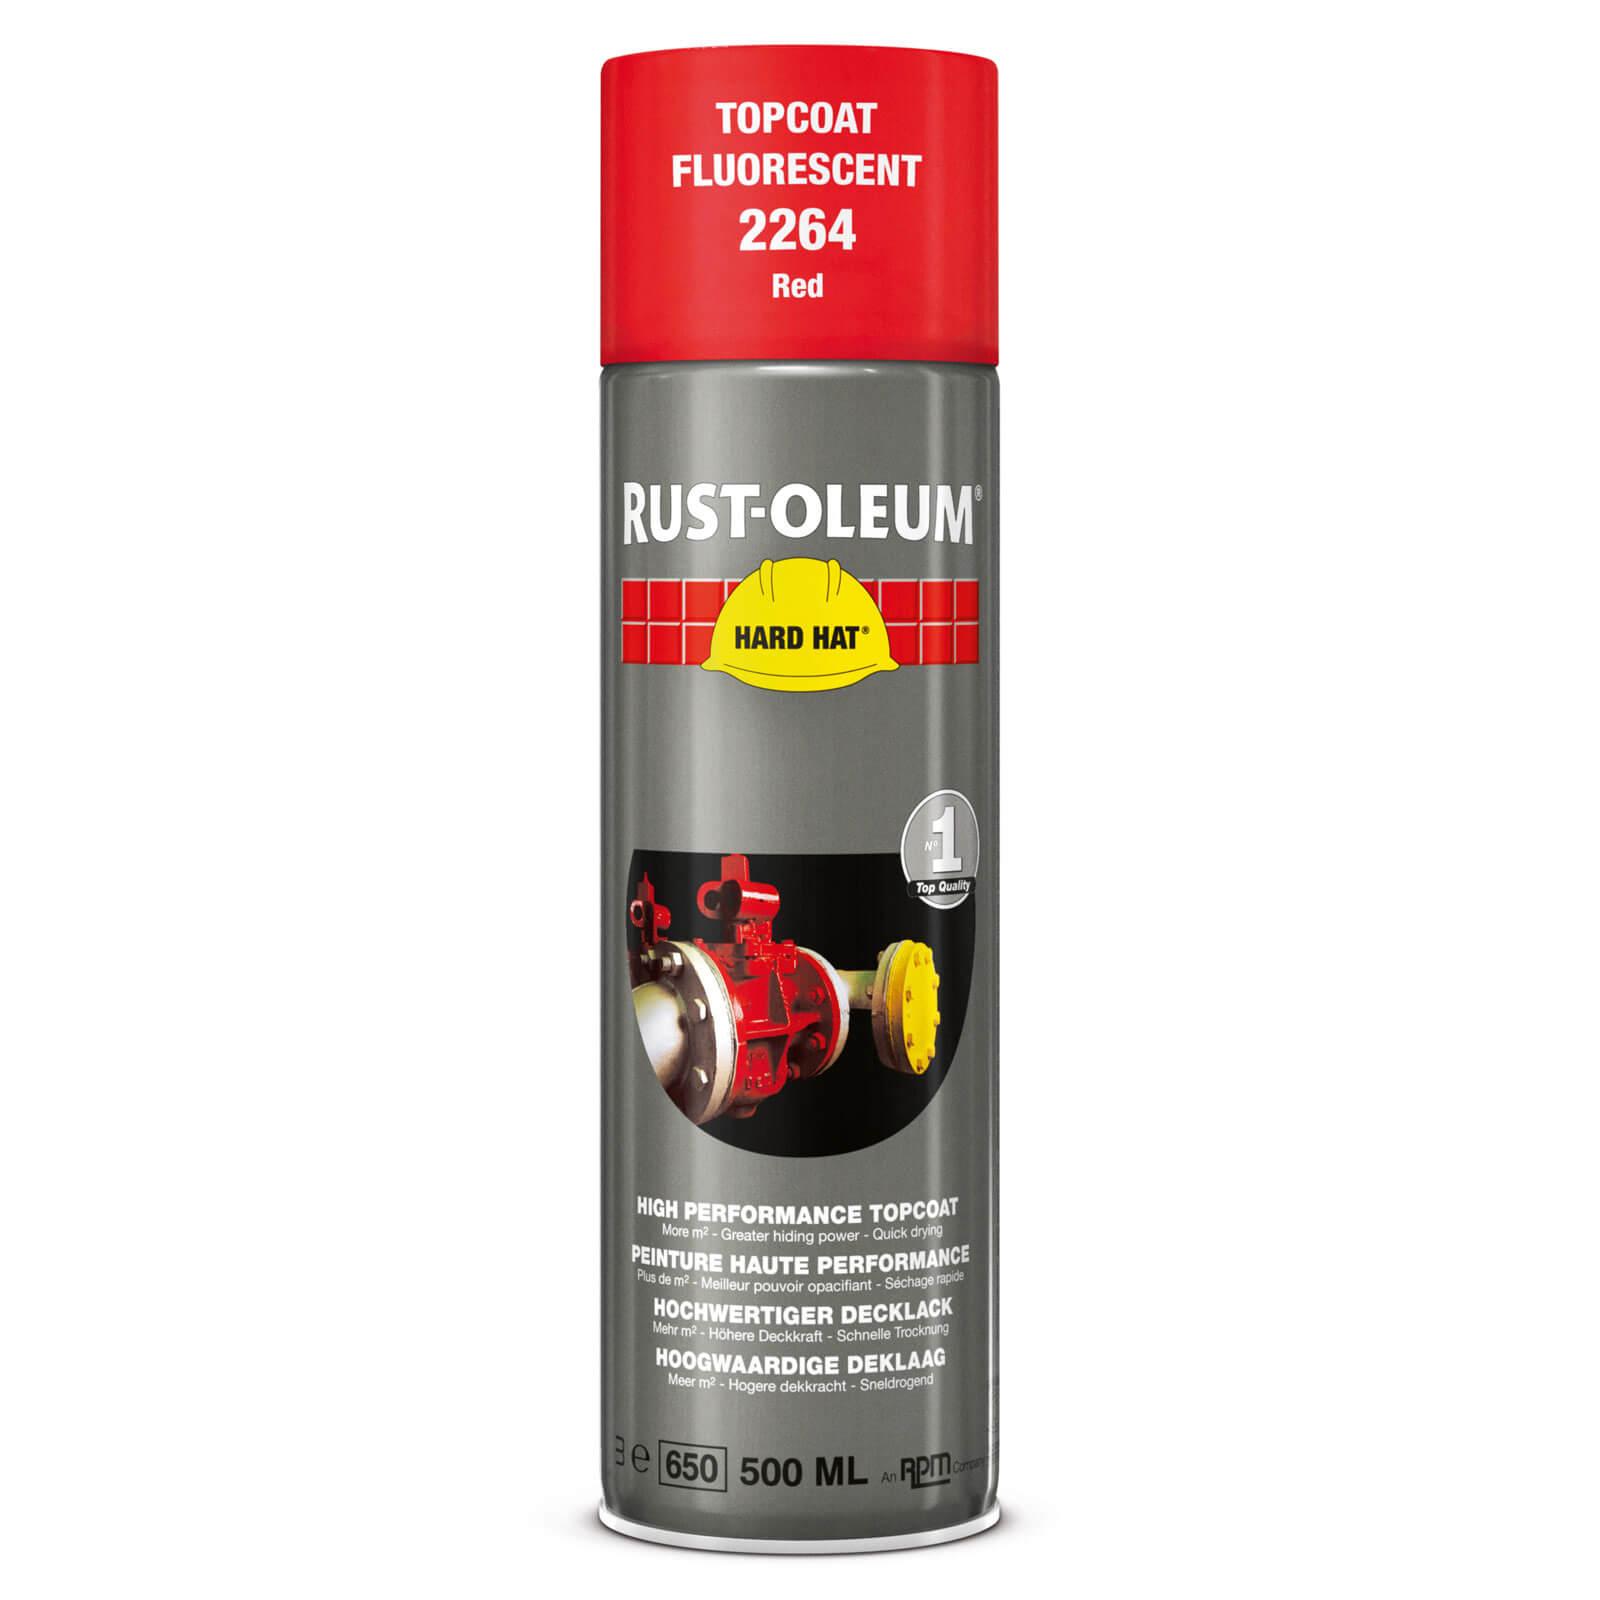 Image of Rust Oleum Hard Hat Fluorescent Spray Paint Red 500ml